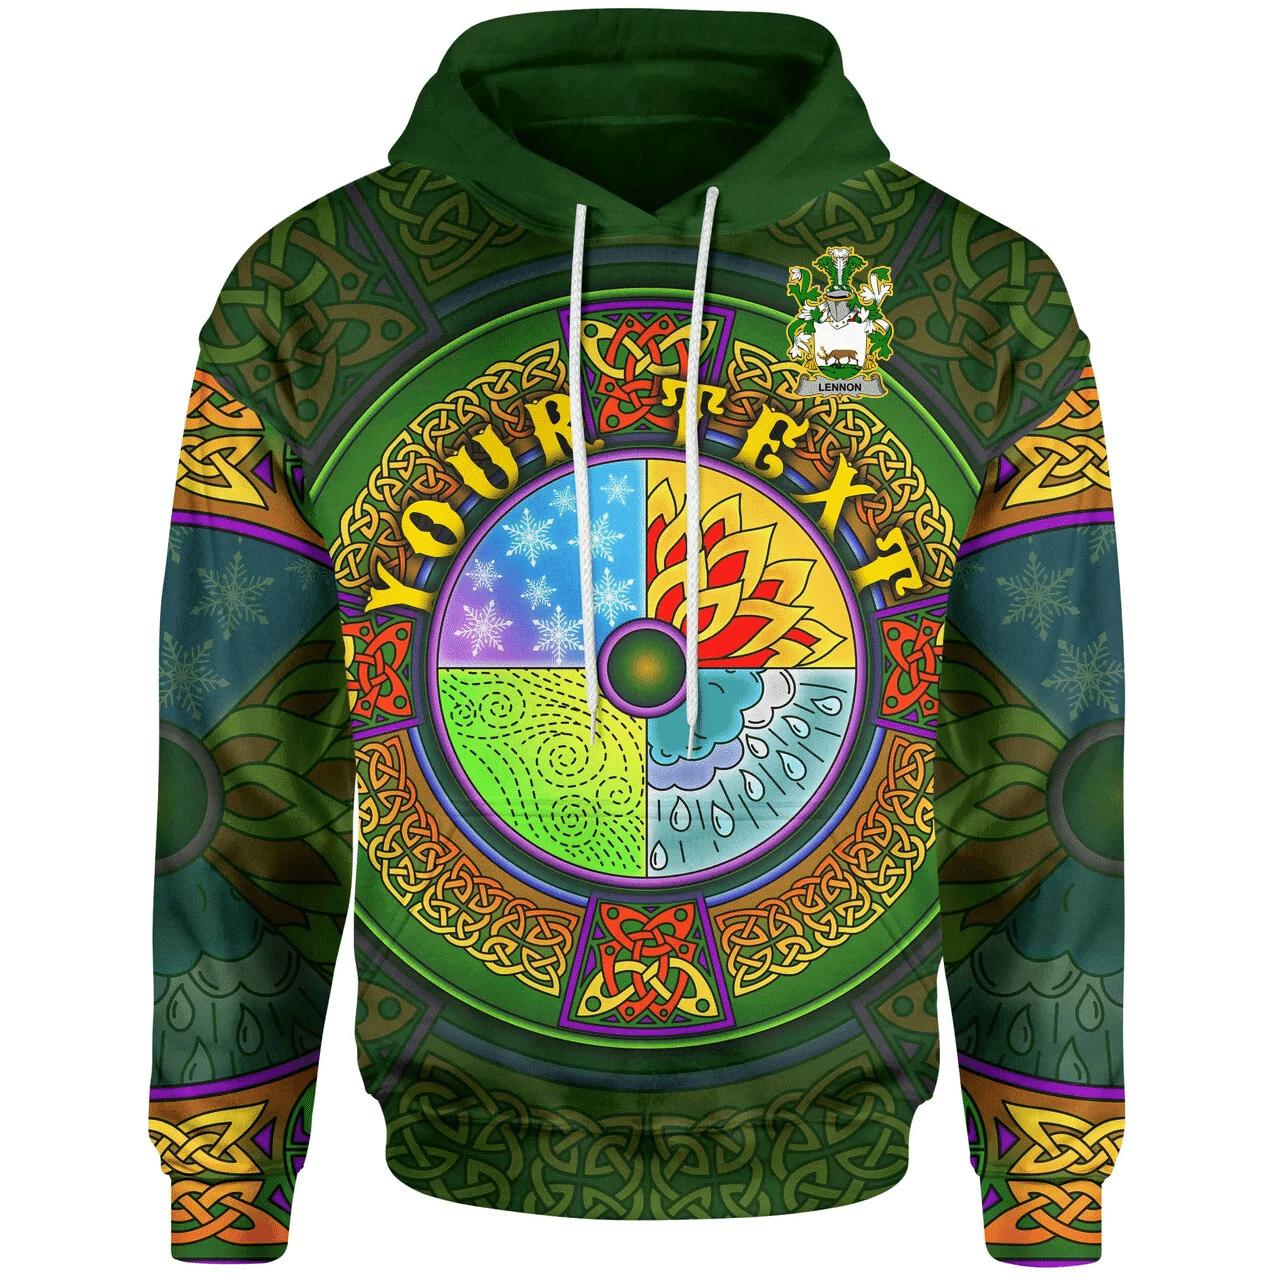 (Custom) 1stIreland Ireland Hoodie - Lennon or O'Lennon Irish Family Crest Hoodie - Celtic Element A7